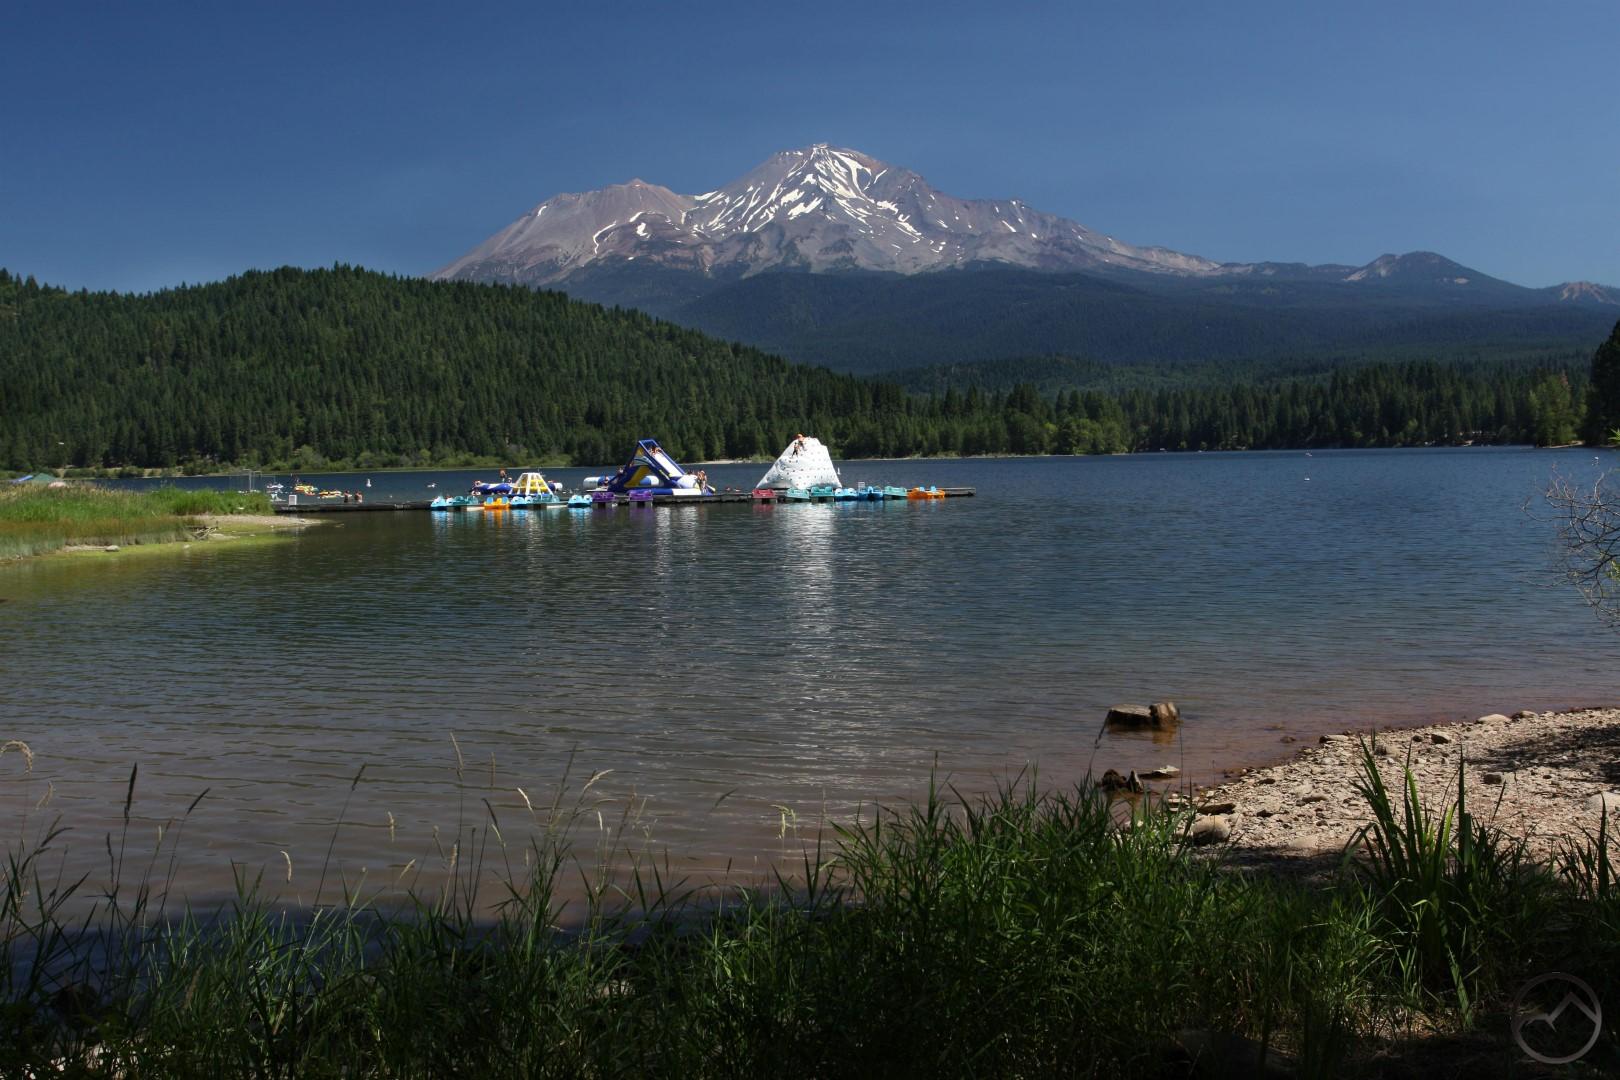 Lake Siskiyou and Shastina